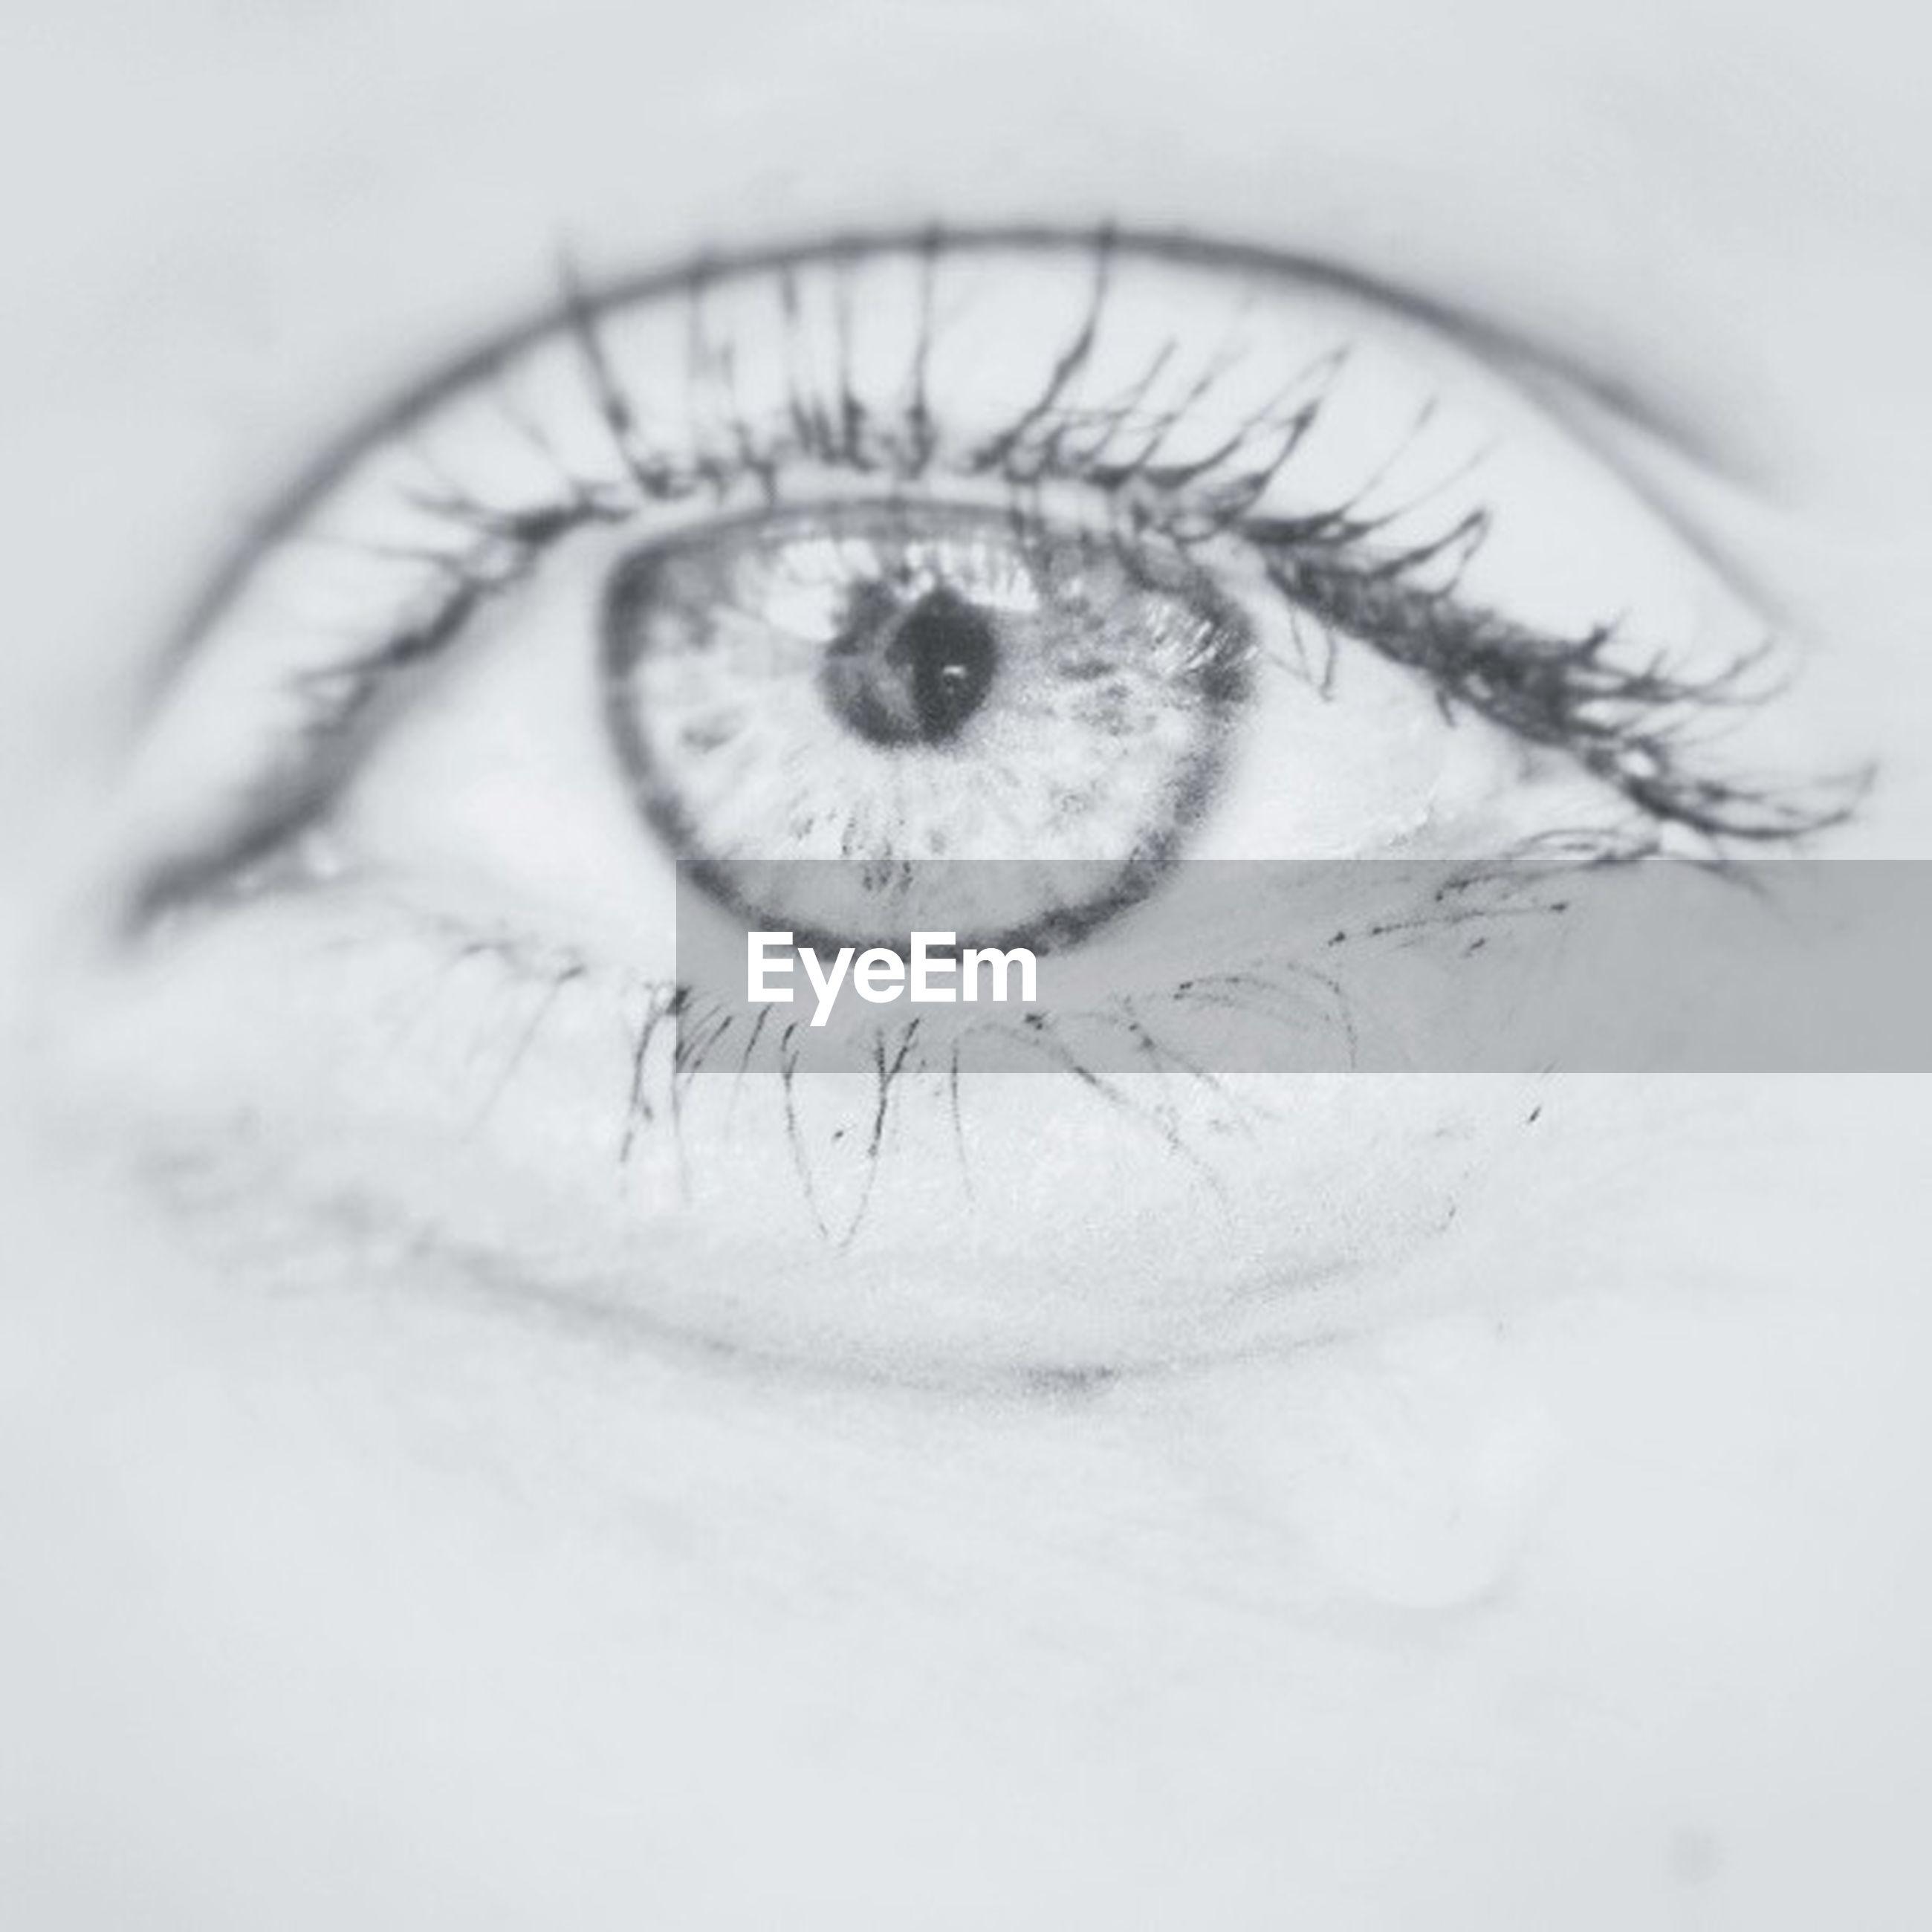 human eye, eyelash, eyesight, close-up, indoors, sensory perception, looking at camera, extreme close-up, portrait, human skin, iris - eye, part of, studio shot, eyeball, white background, human face, vision